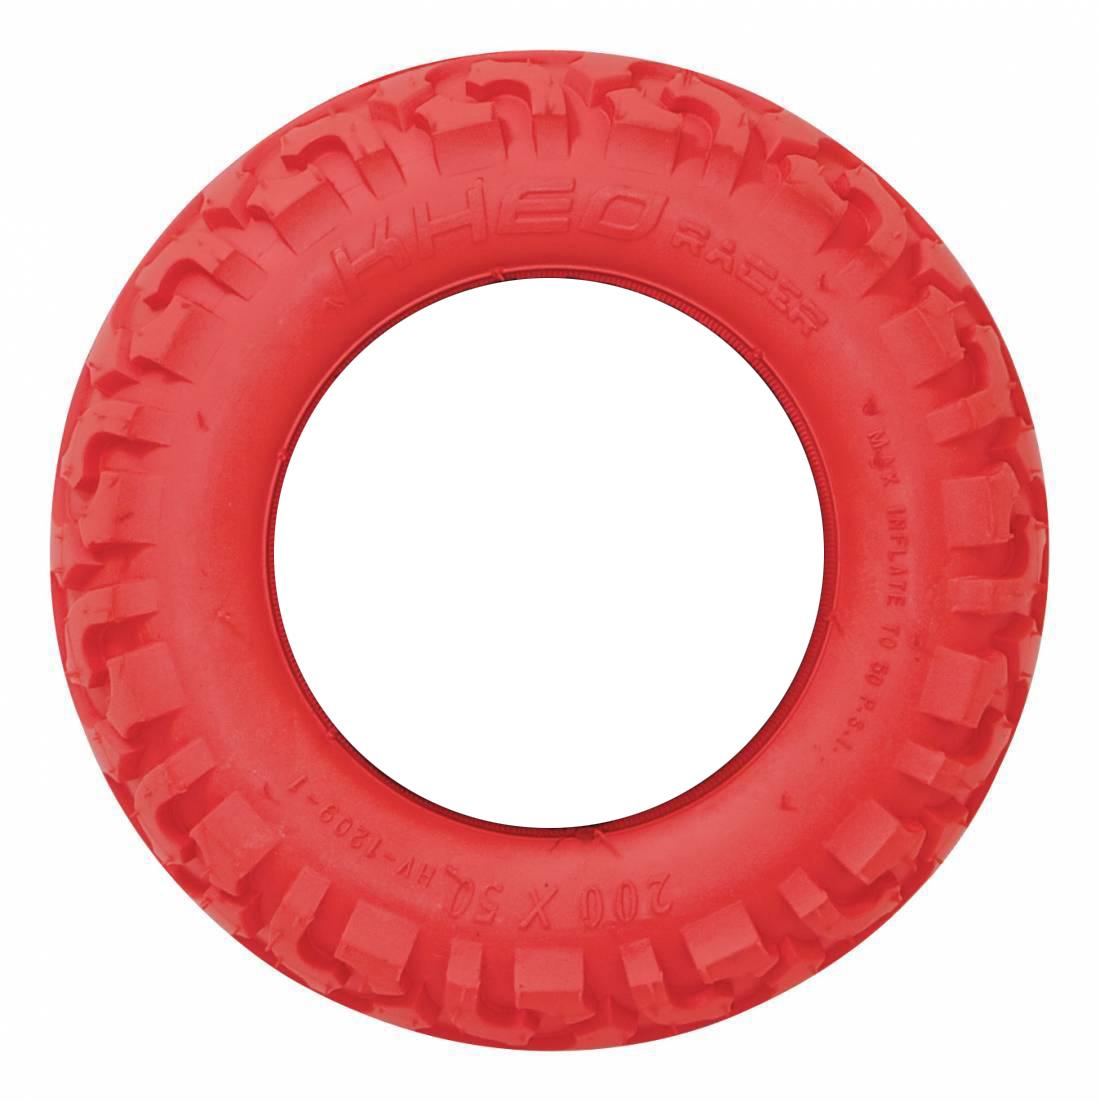 "Kheo 8"" buitenband rood"